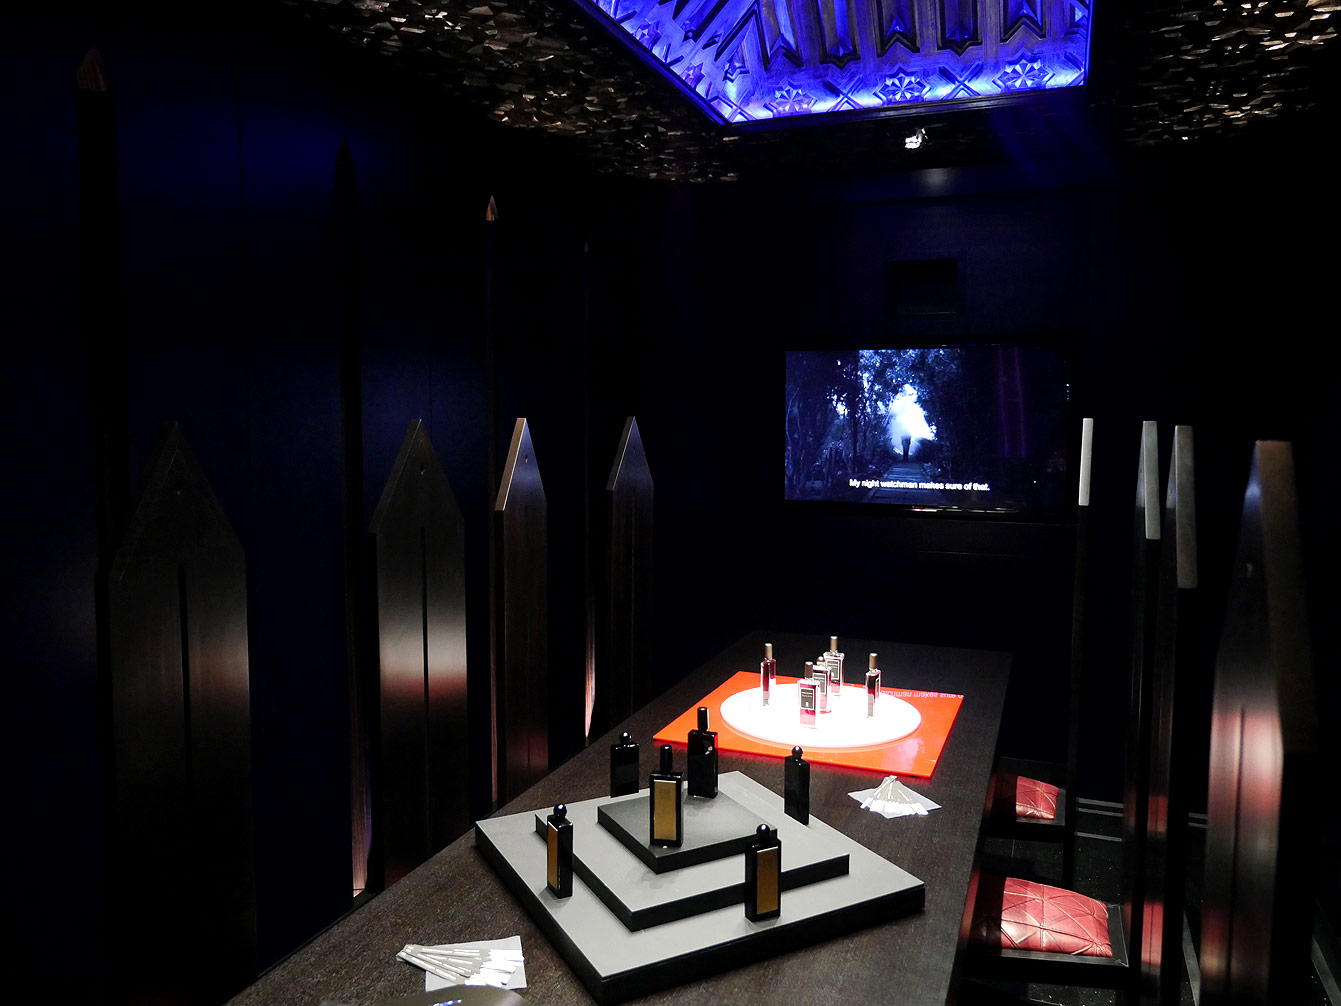 serge-lutens-espace-palais-royal-14